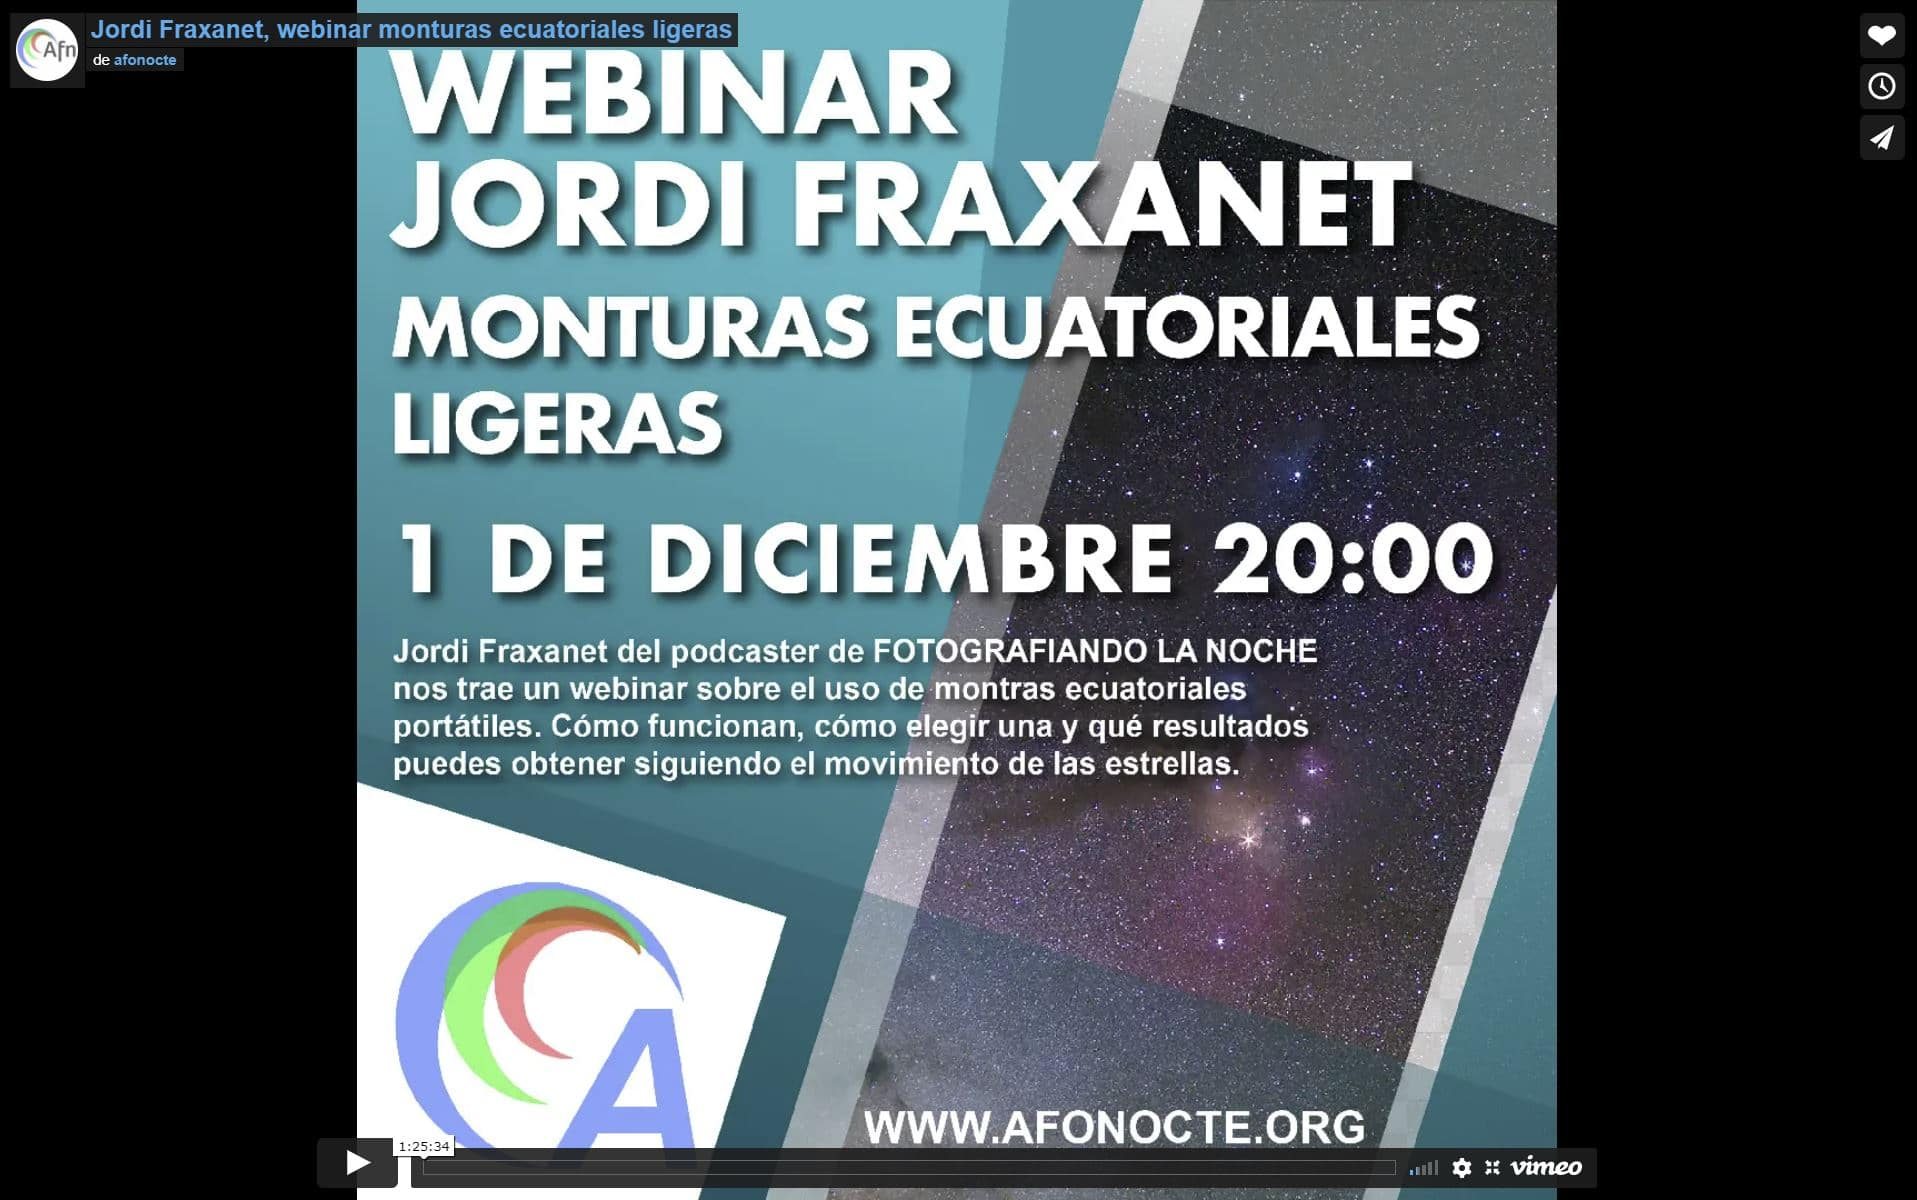 Webinar sobre monturas ecuatoriales portables para Afonocte